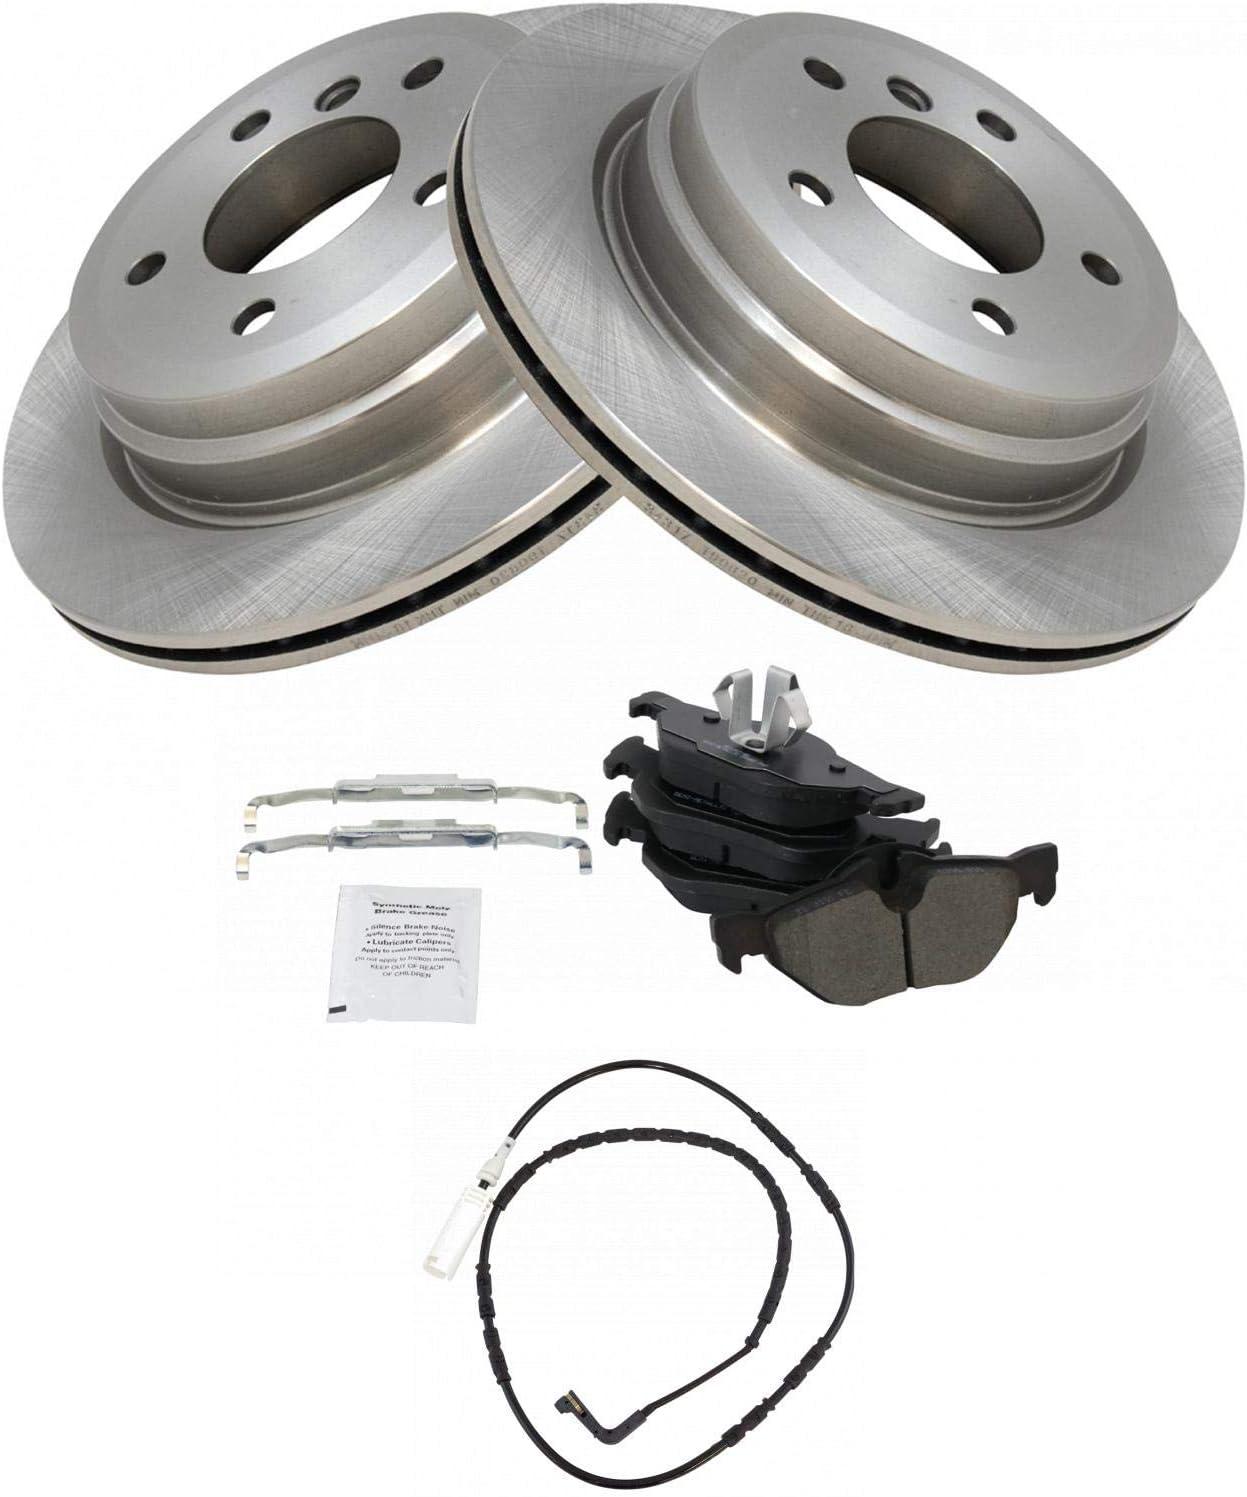 Brake Pad Rotor Wear Sensor Kit BMW Rear 328i 永遠の定番モデル for お得クーポン発行中 328xi Metallic